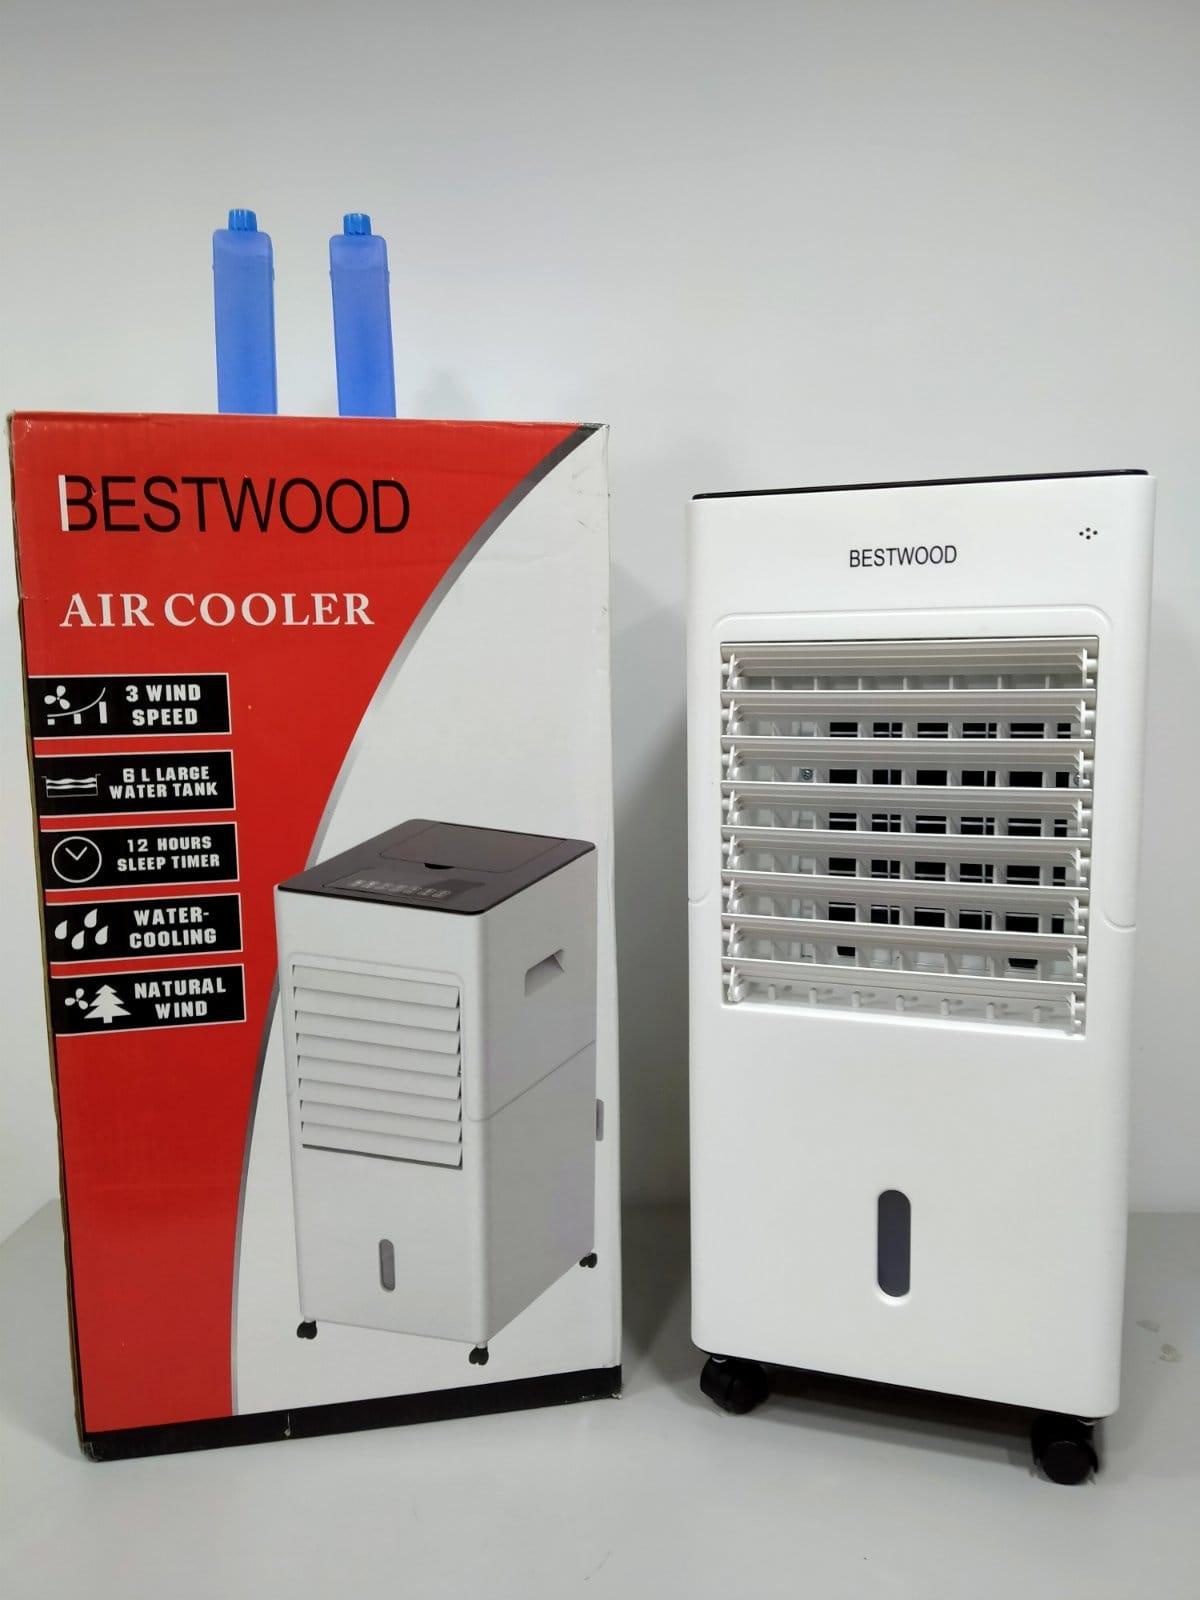 Air Cooler Bestwood 6L